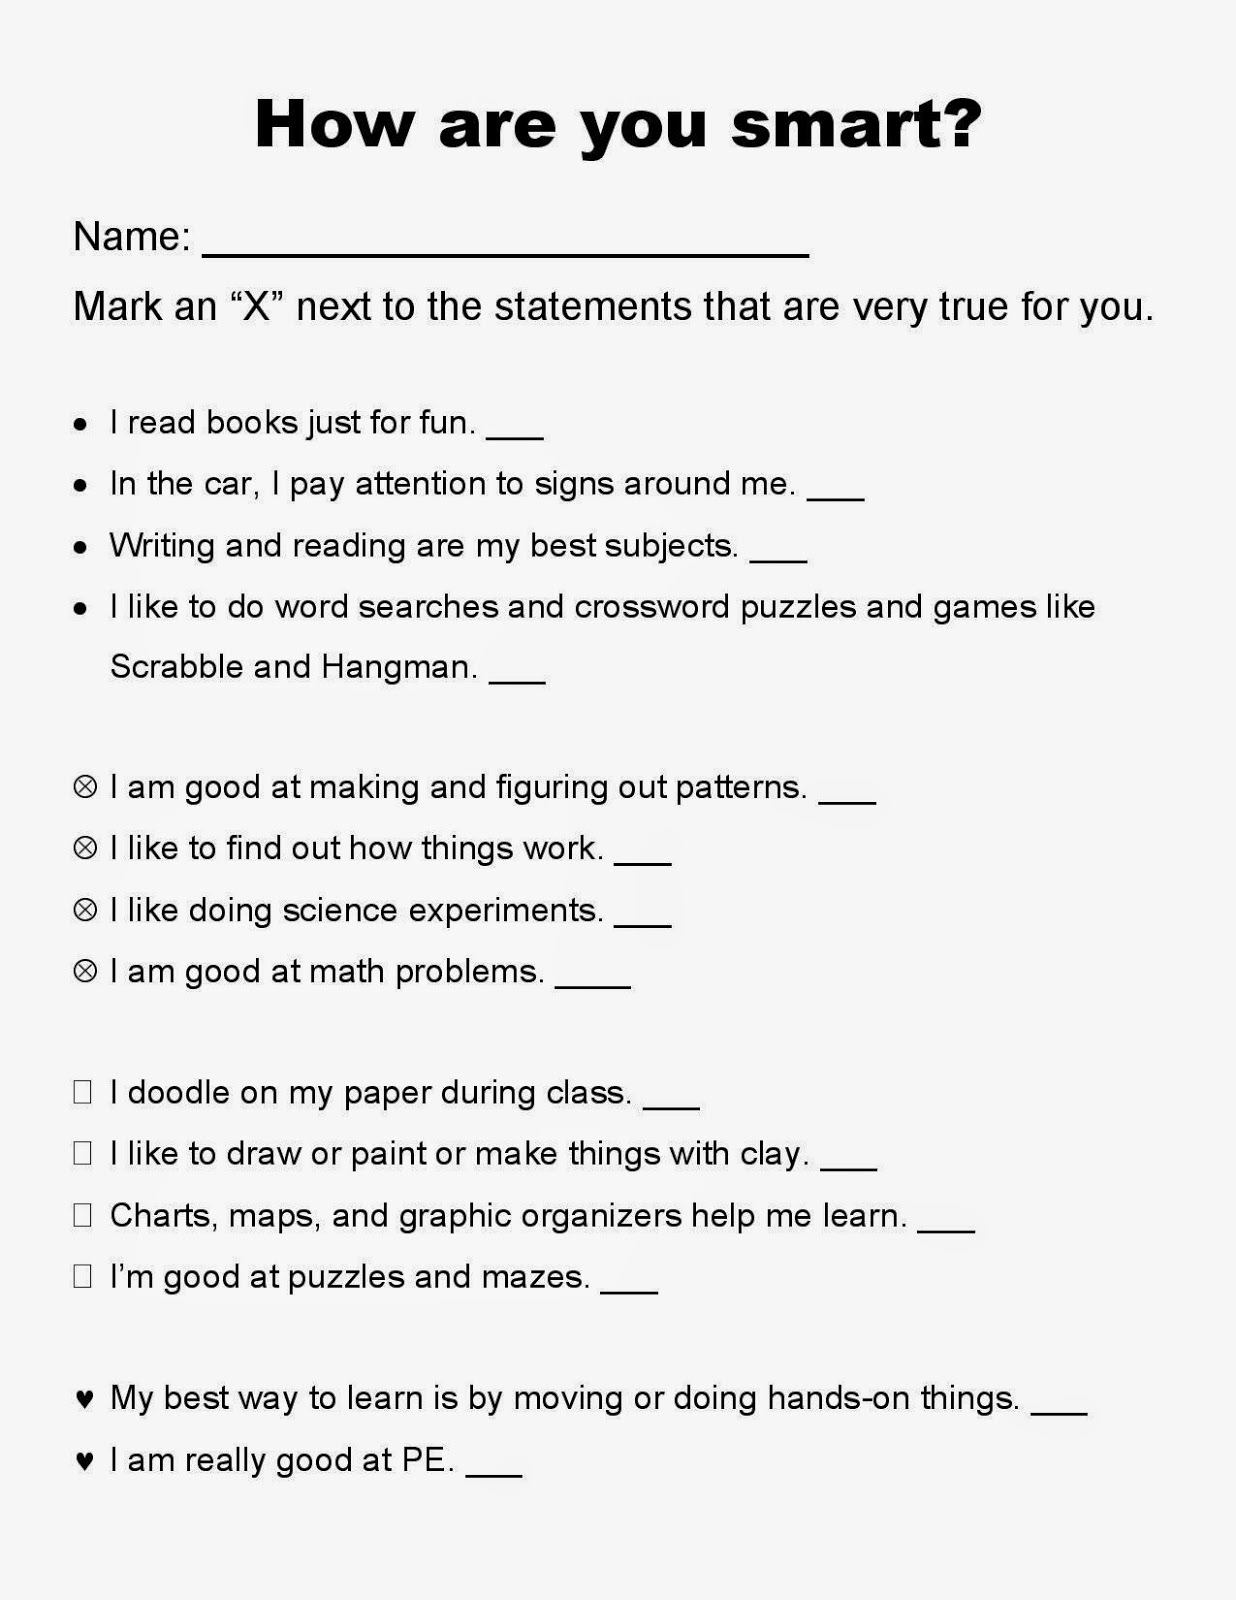 Multiple Intelligences Lesson, Survey questionairre, Multiple Intelligence Key and  Worksheet for elementary students